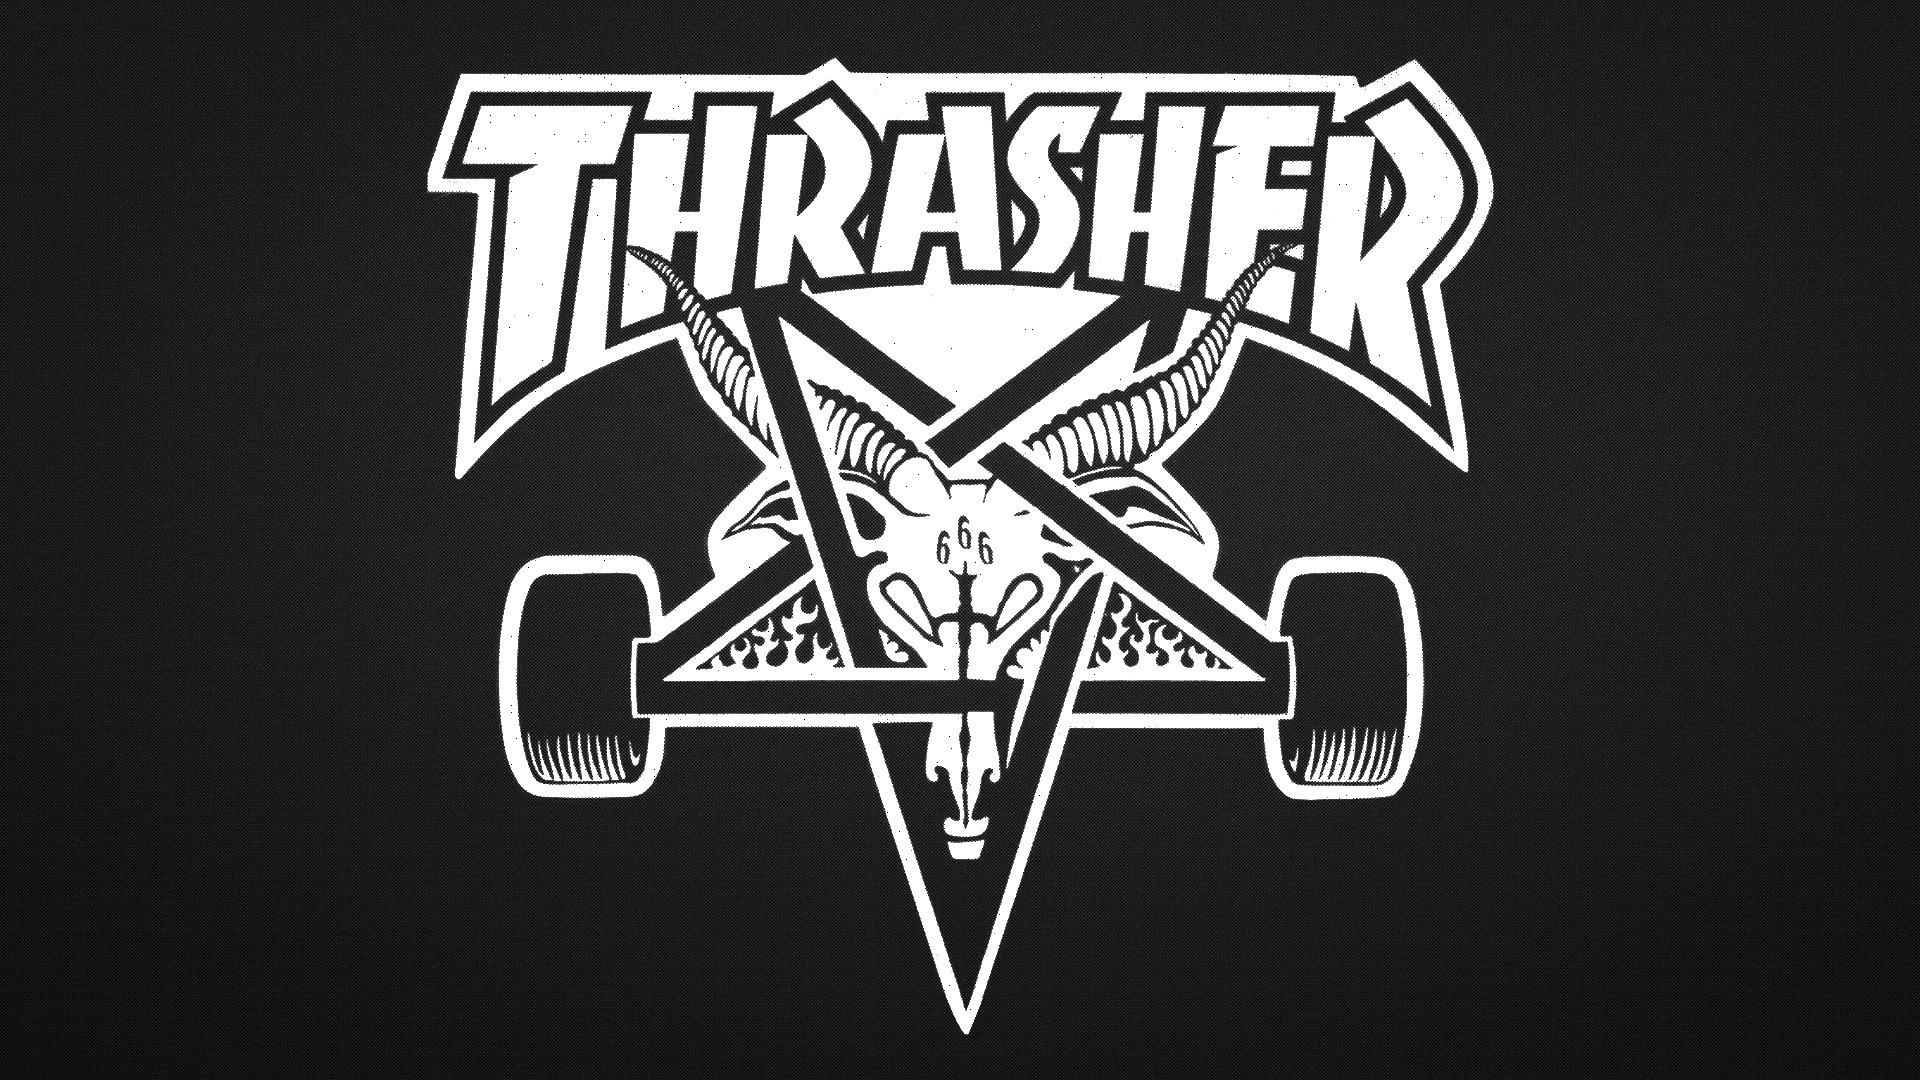 Res: 1920x1080, Thrasher pentagram logo - photo#5